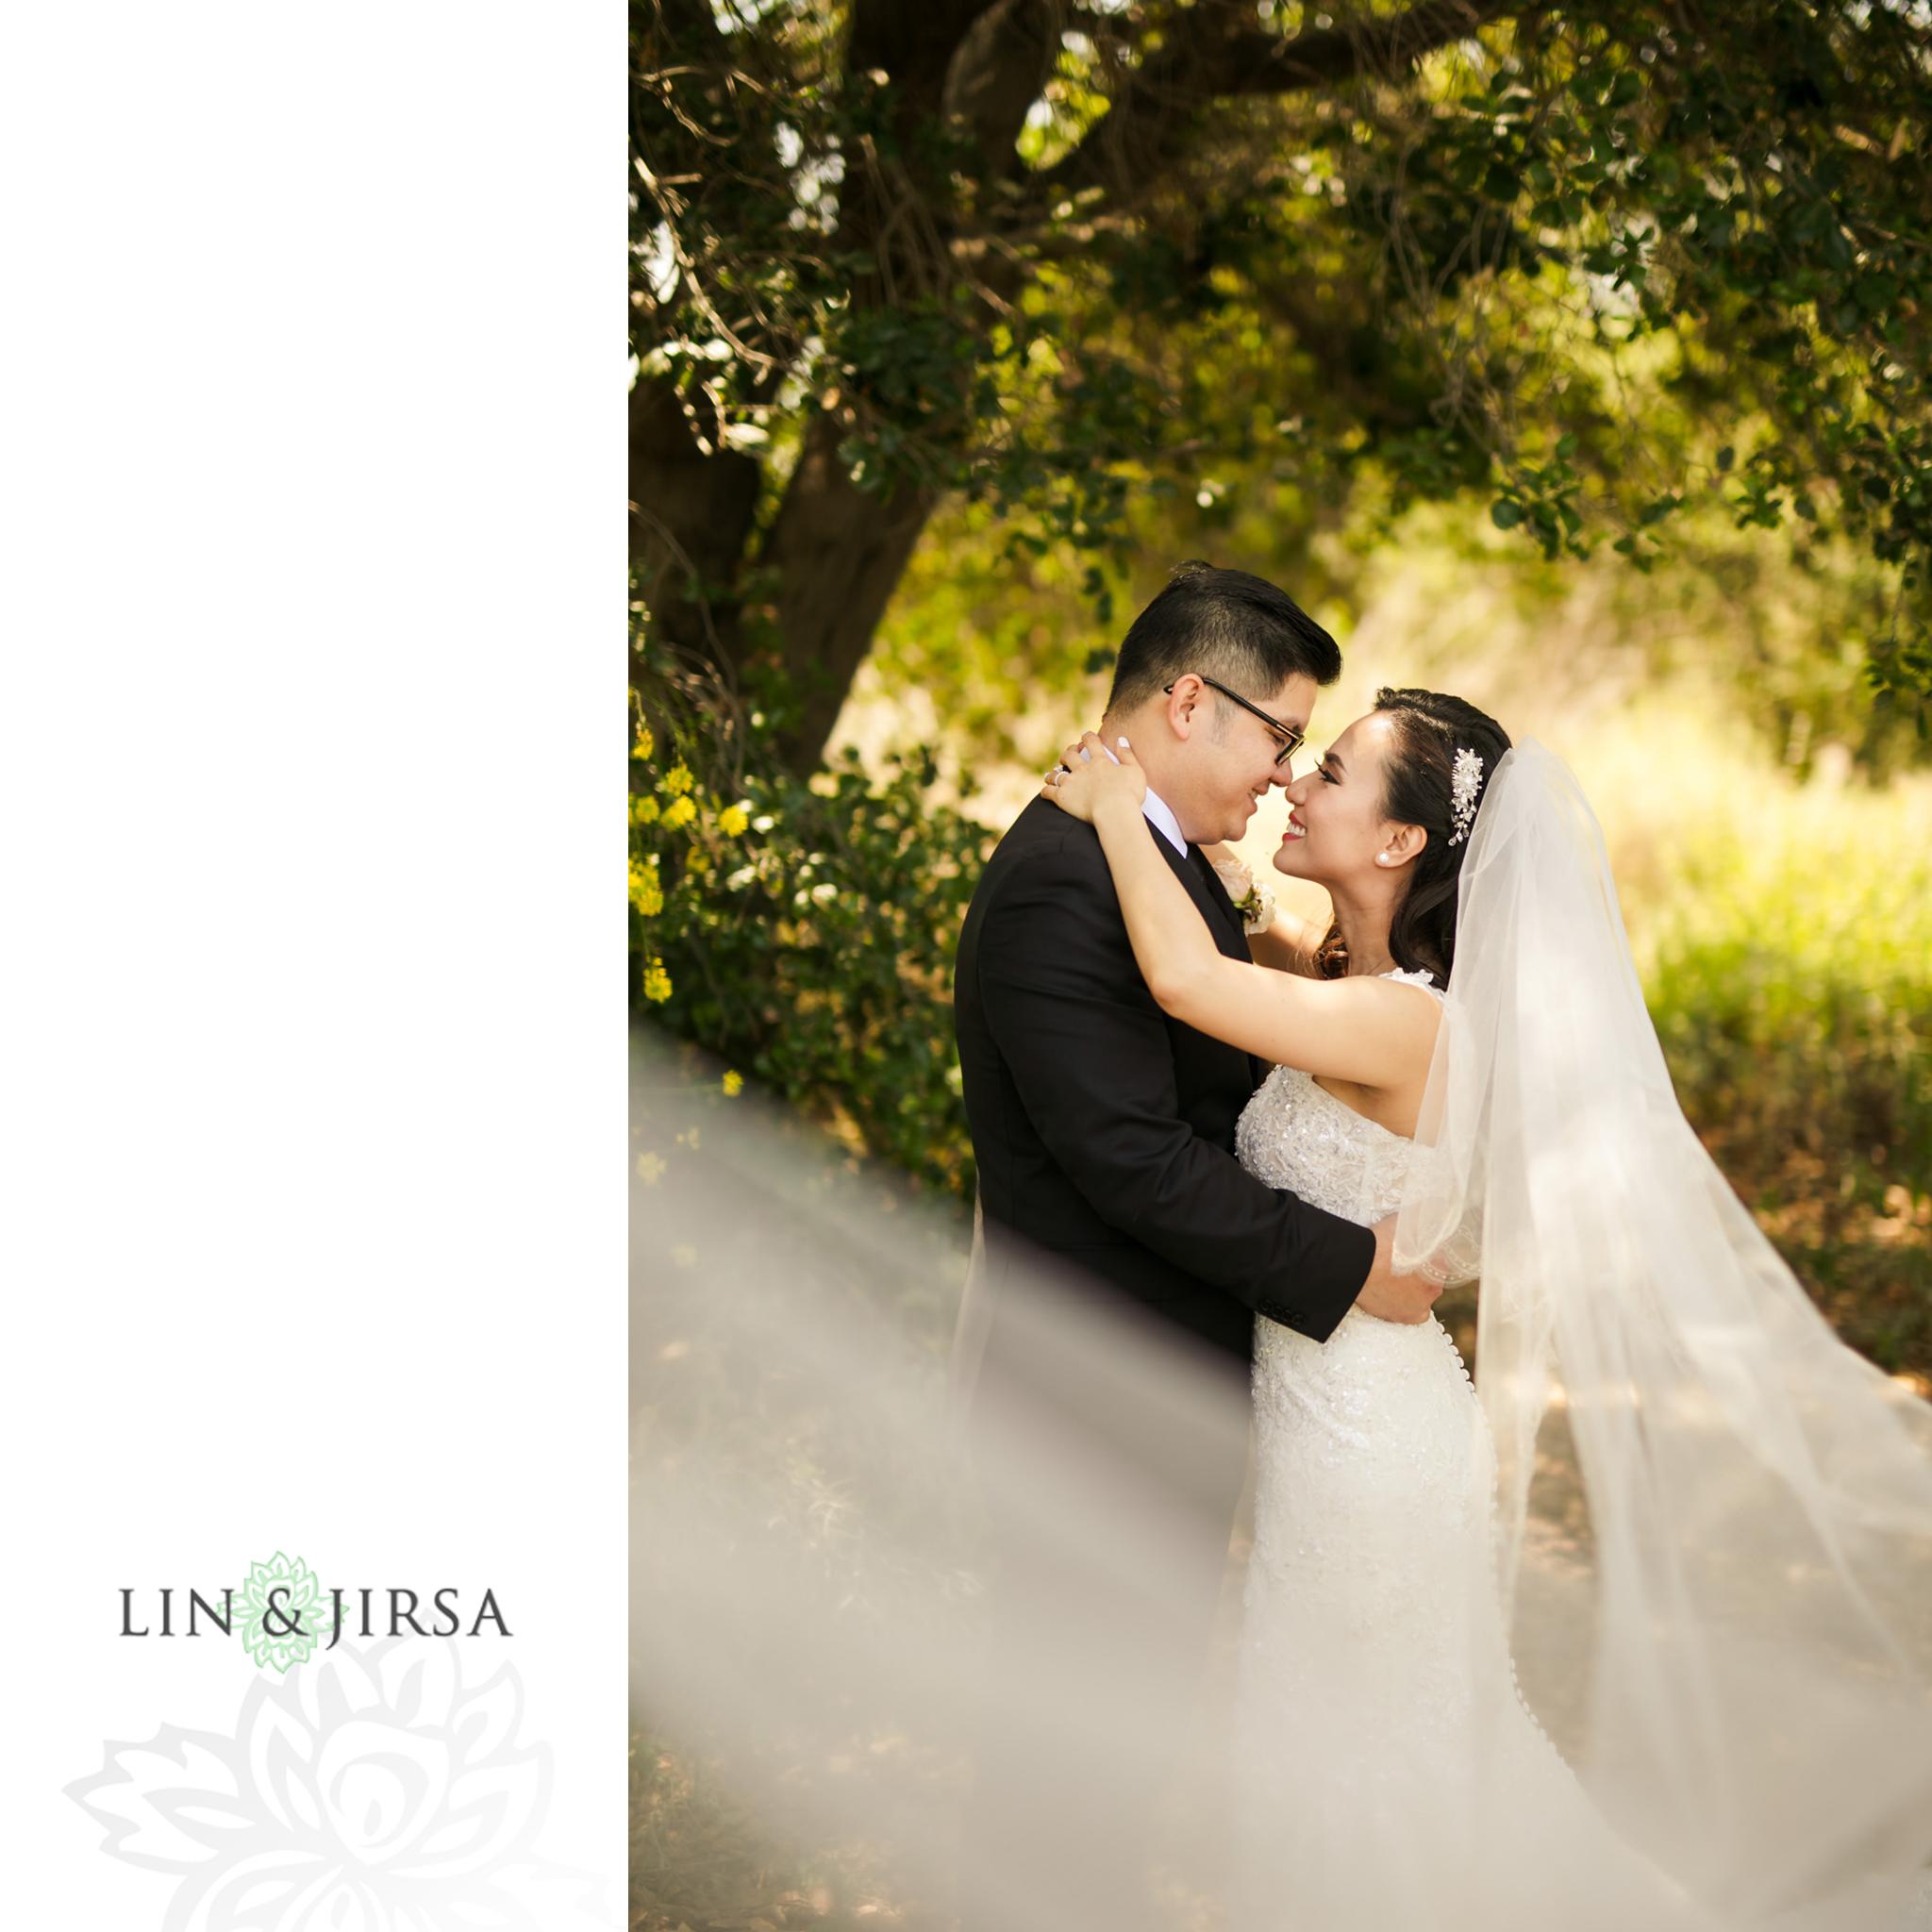 10 Mission Basilica San Juan Capistrano Wedding Photography